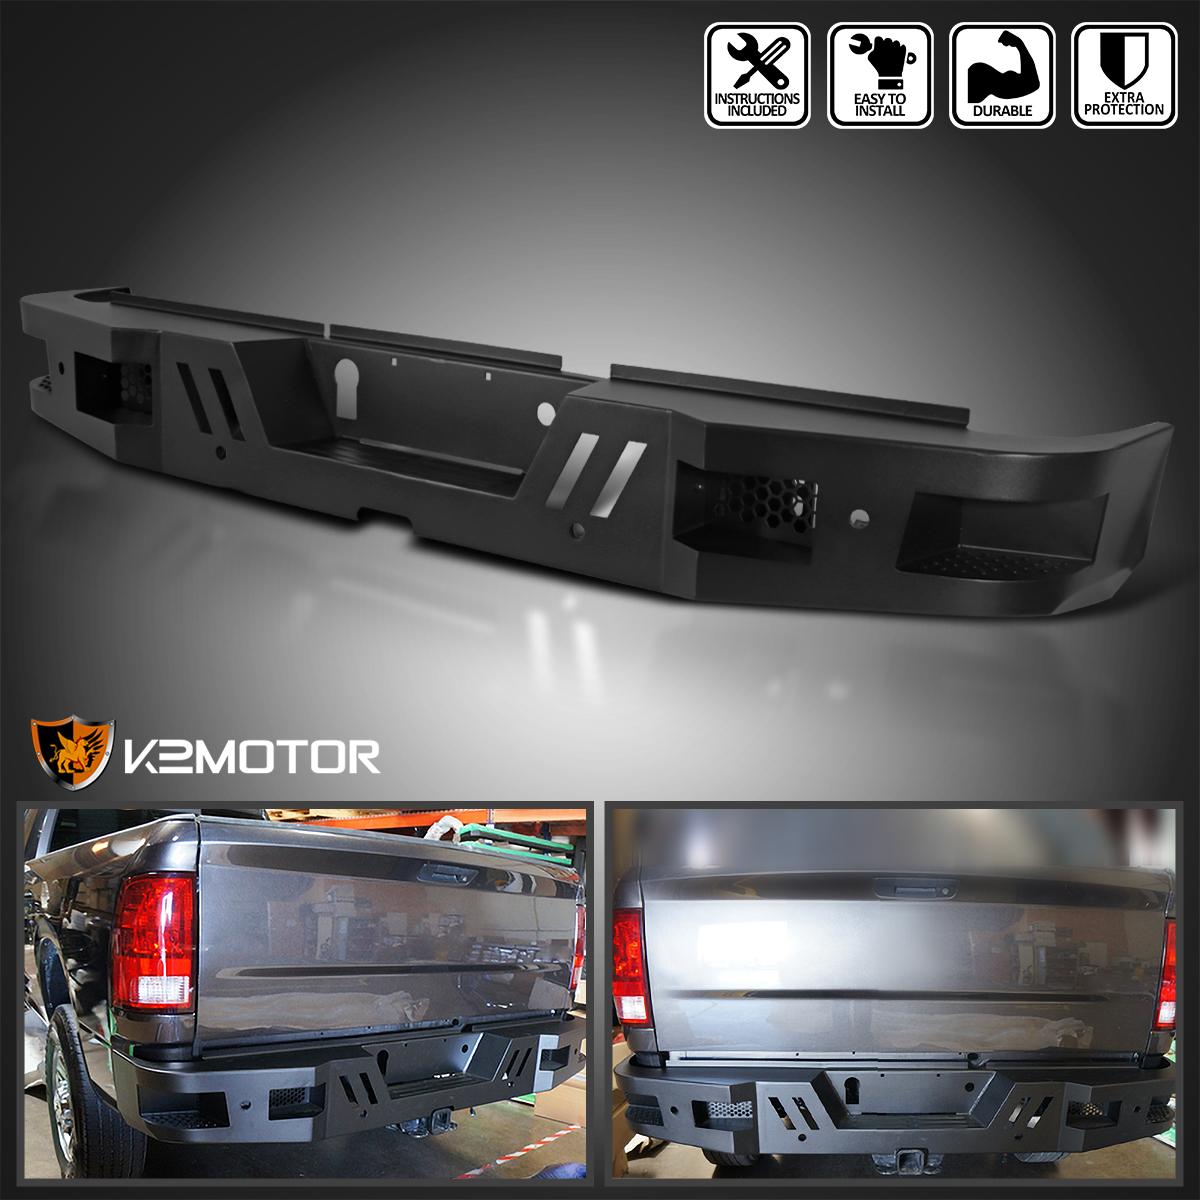 2011-2019 Chevy Silverado GMC Sierra 2500 3500 Rear Step Bumper Guard HeavyDuty